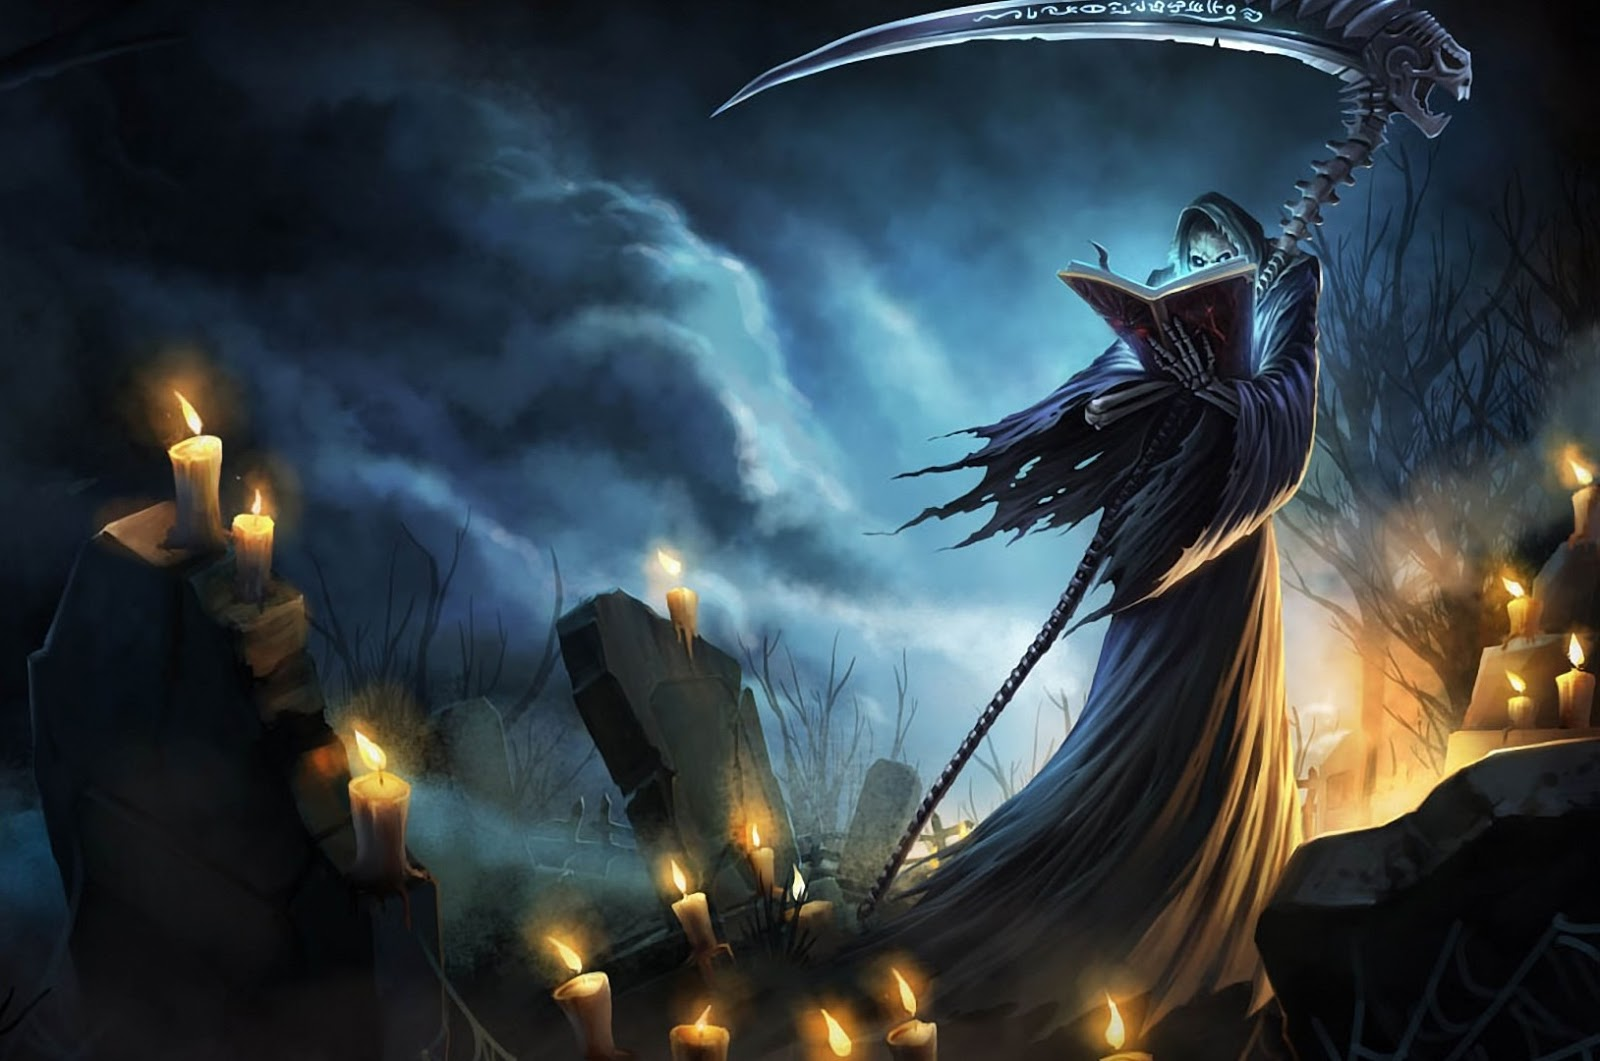 http://2.bp.blogspot.com/-aBG1evSam98/UIA3MW8vhfI/AAAAAAAAOVM/COlCgnZk8vA/s1600/death+in+a+graveyard+grim+reaper+fantasy+spell+book+scythe+candles+cool+phi+stars+5+stars+wallpaper+fantasy.jpg